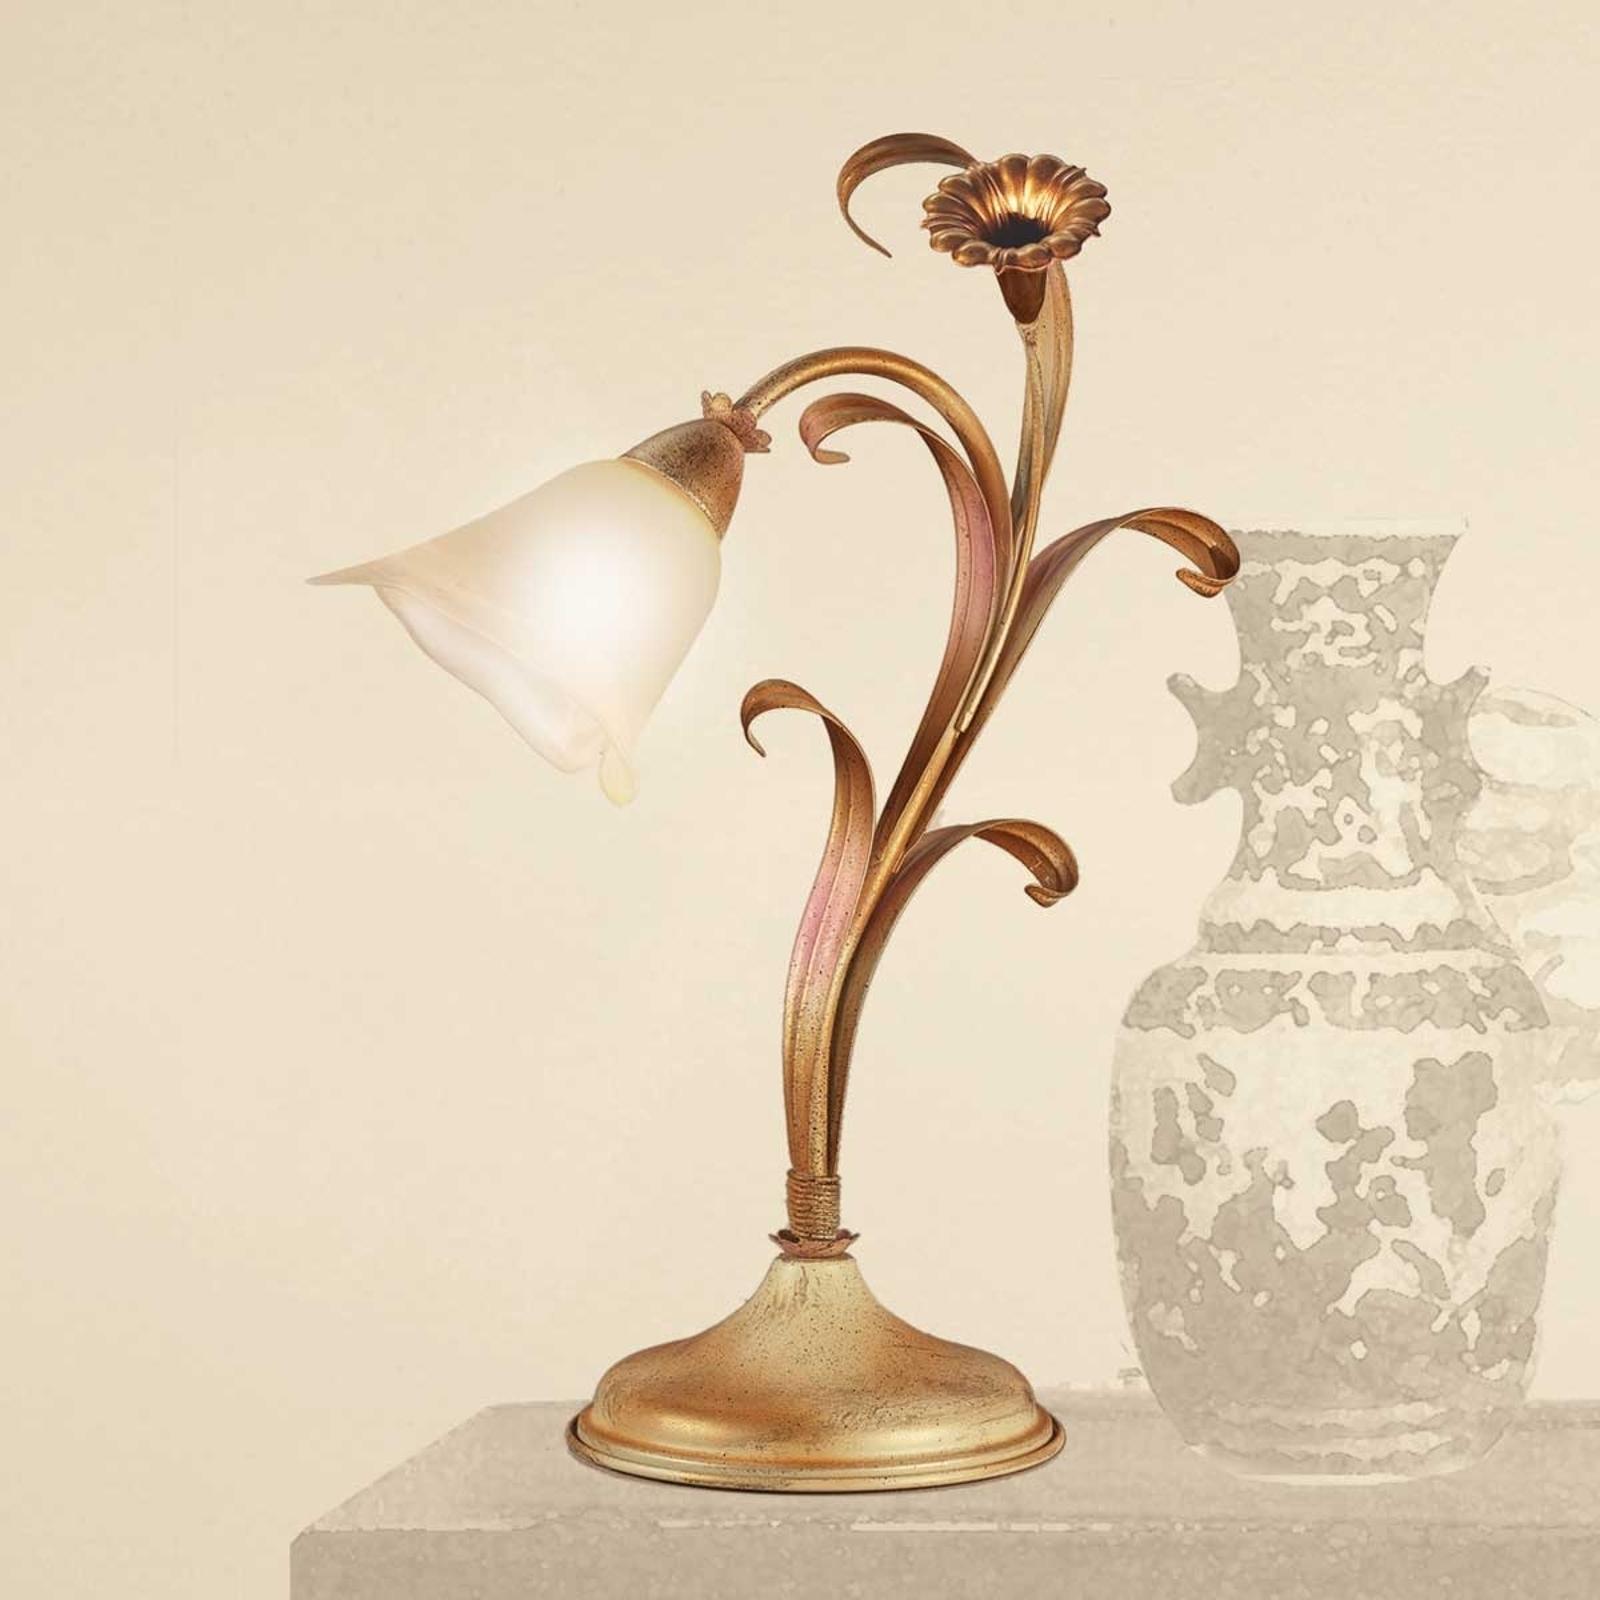 Florentyńska lampa stołowa Giovanni